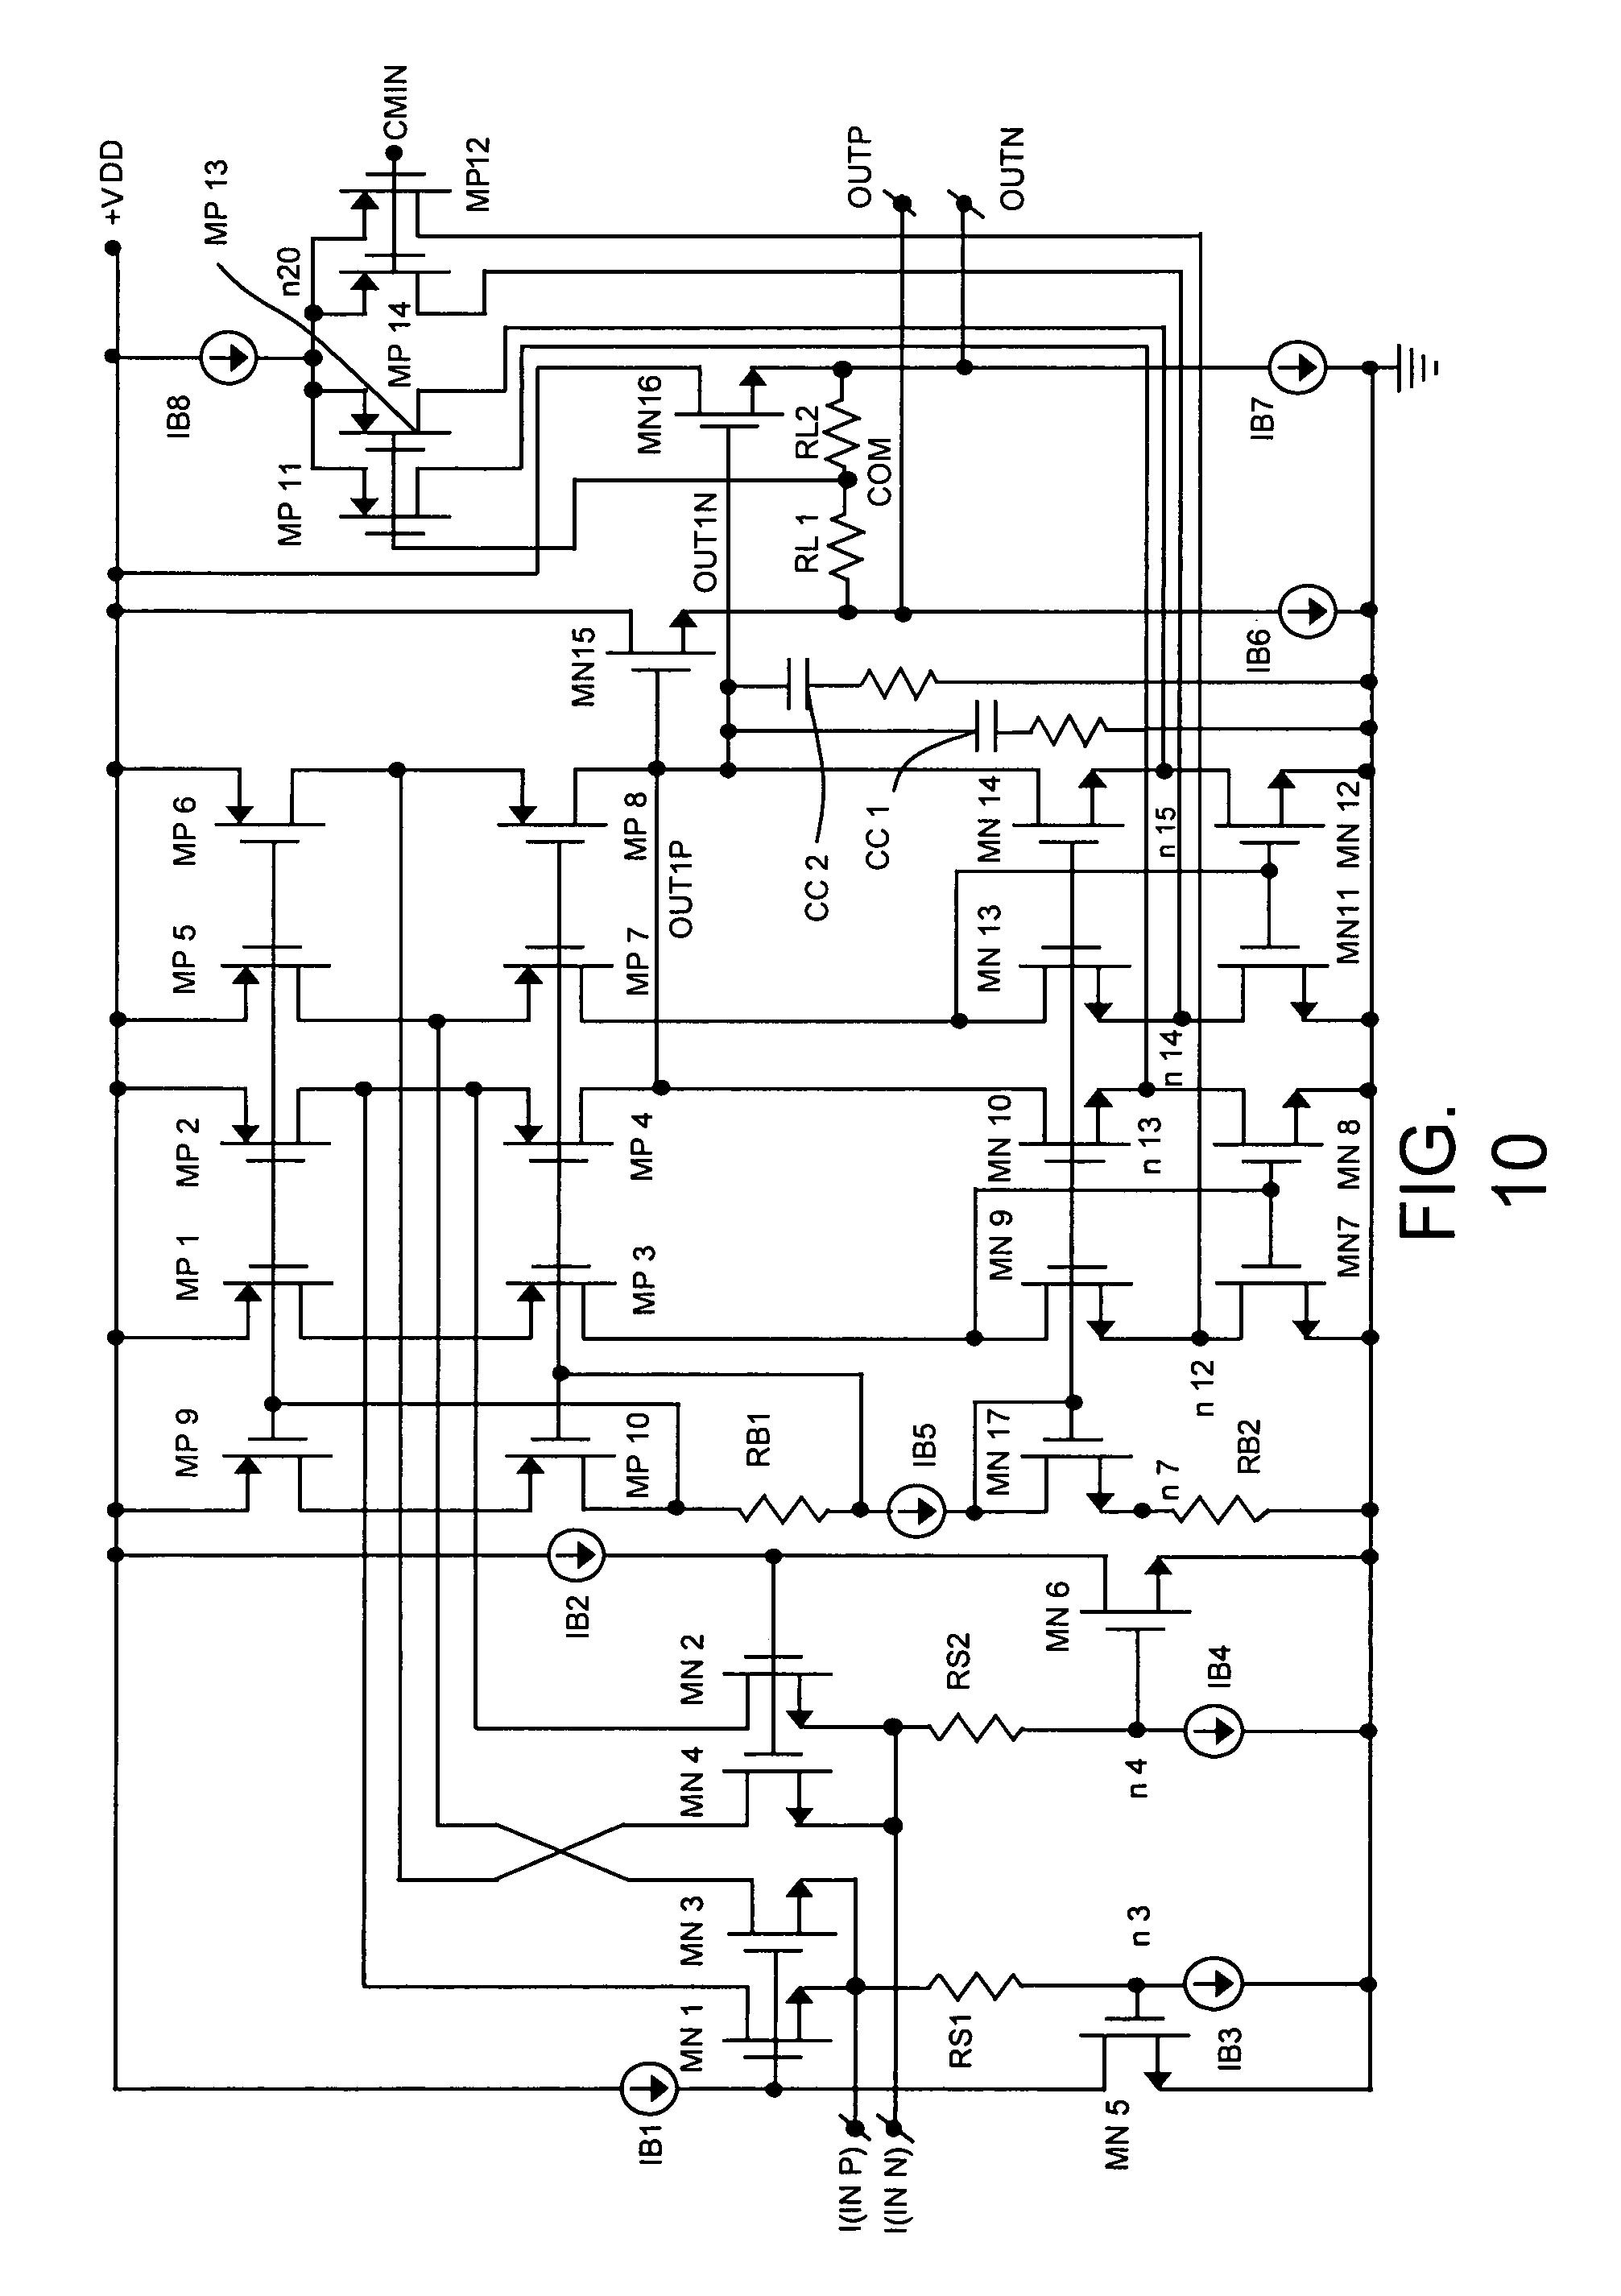 Ahuja Amplifier Connection Diagram Circuit Of Amplifierrhsvlcusdesign